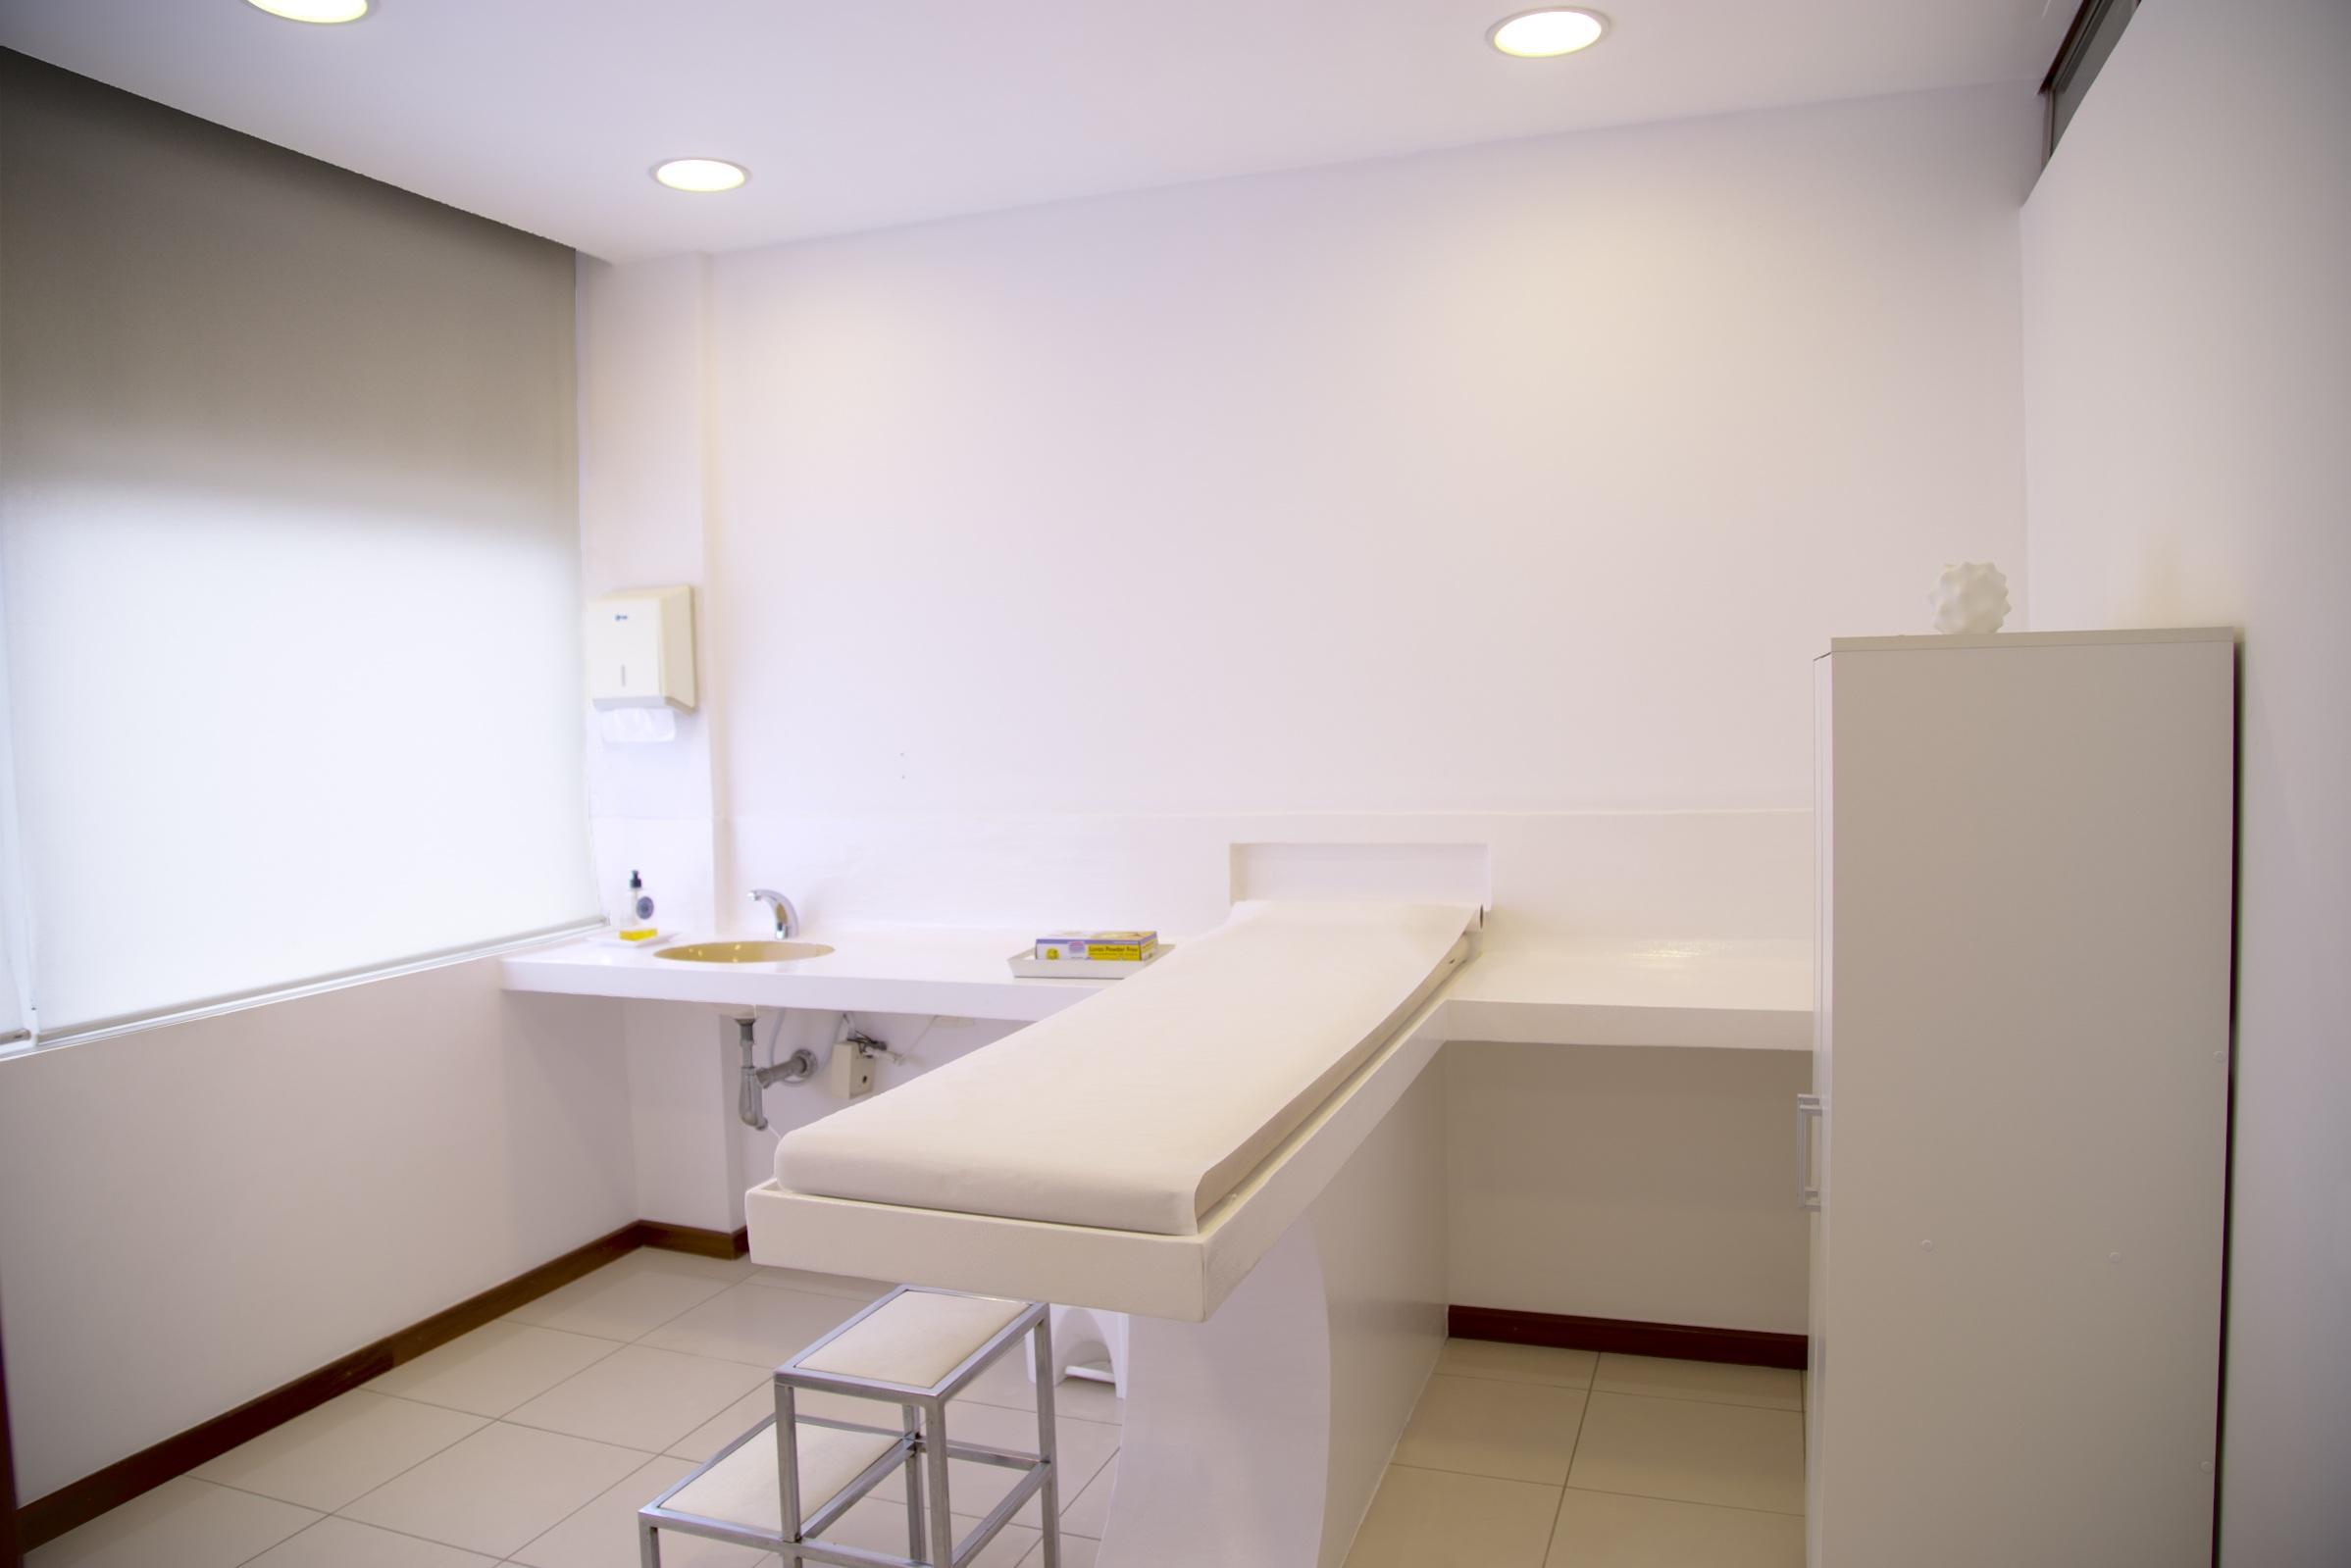 treatment-room-548143